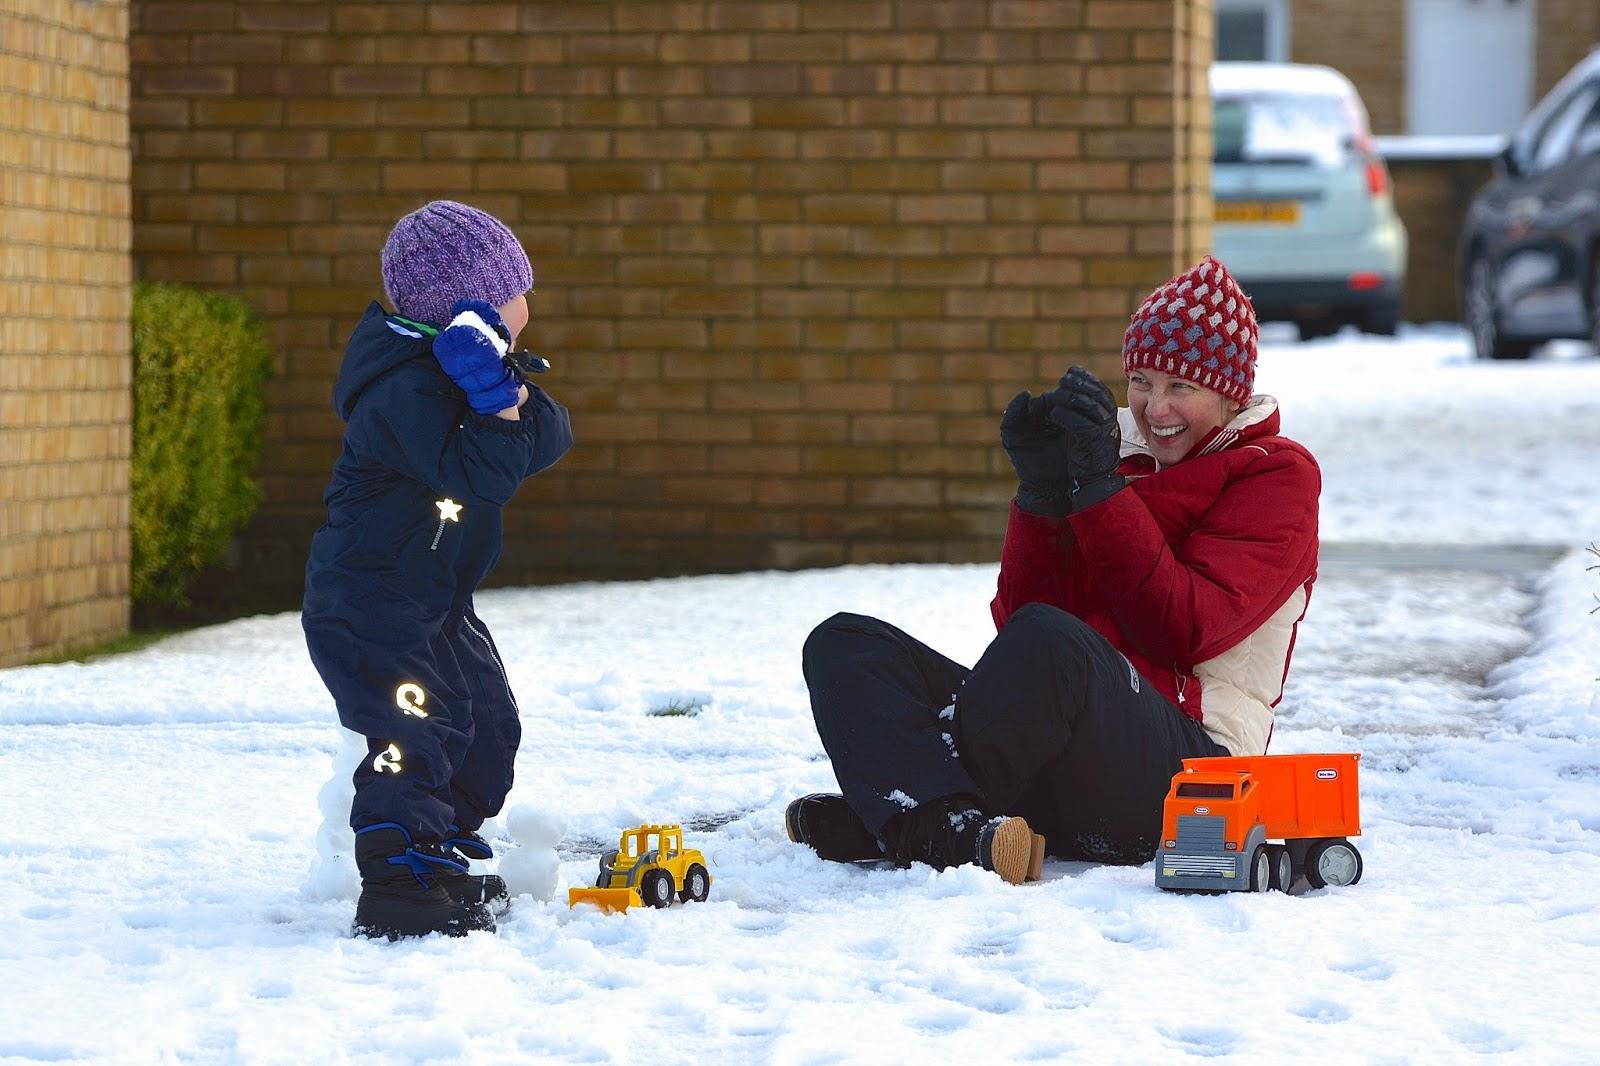 Jackson throws a snowball at Kate